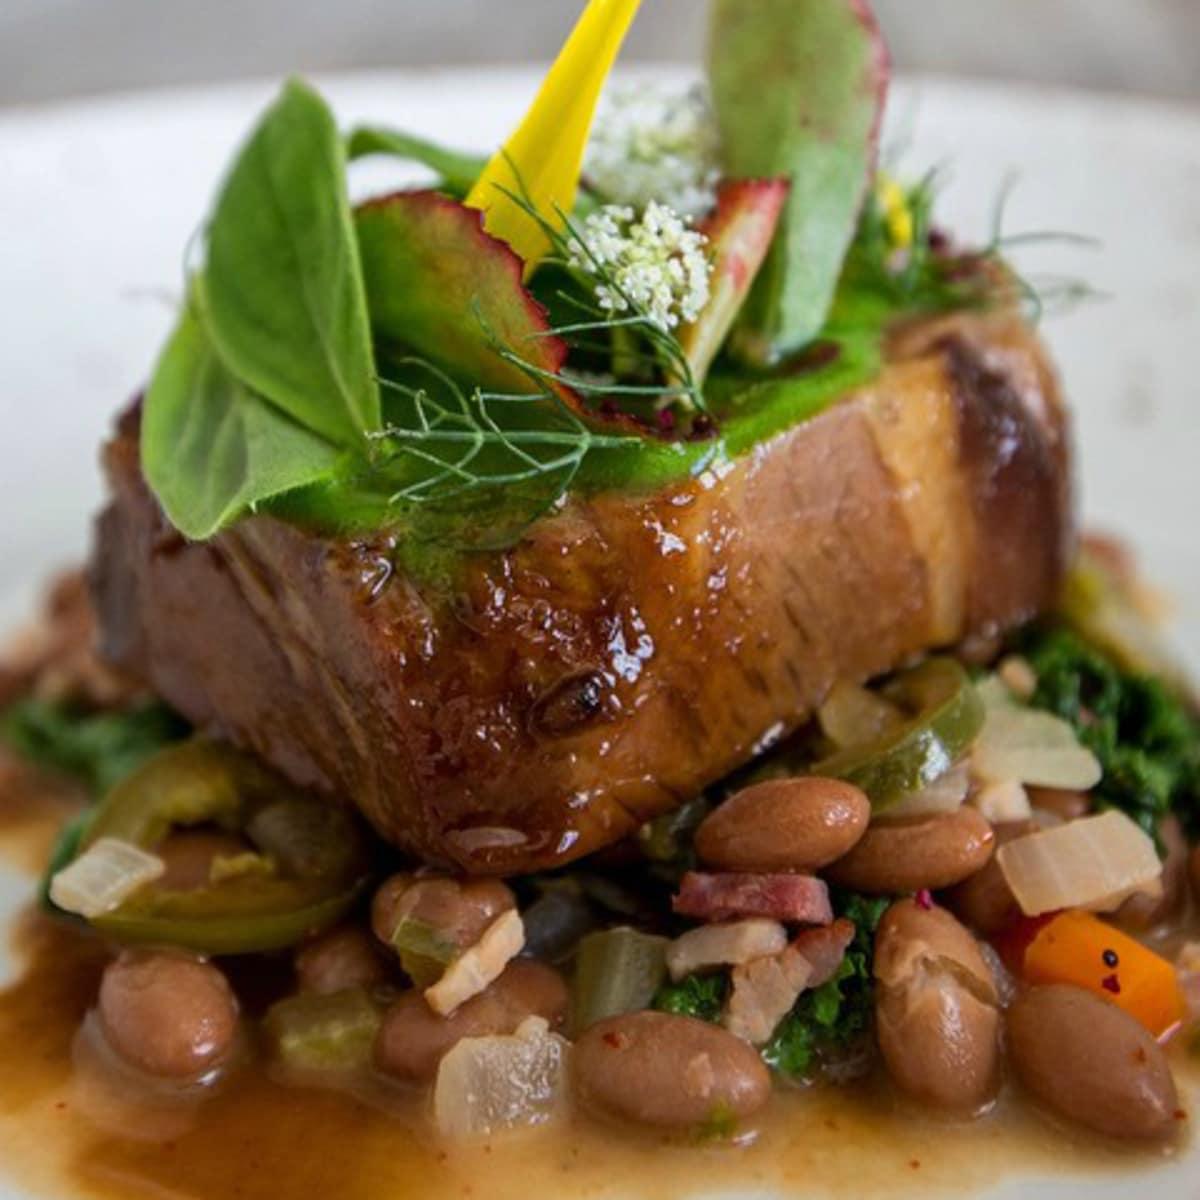 Fixe restaurant pork shoulder dish 2015